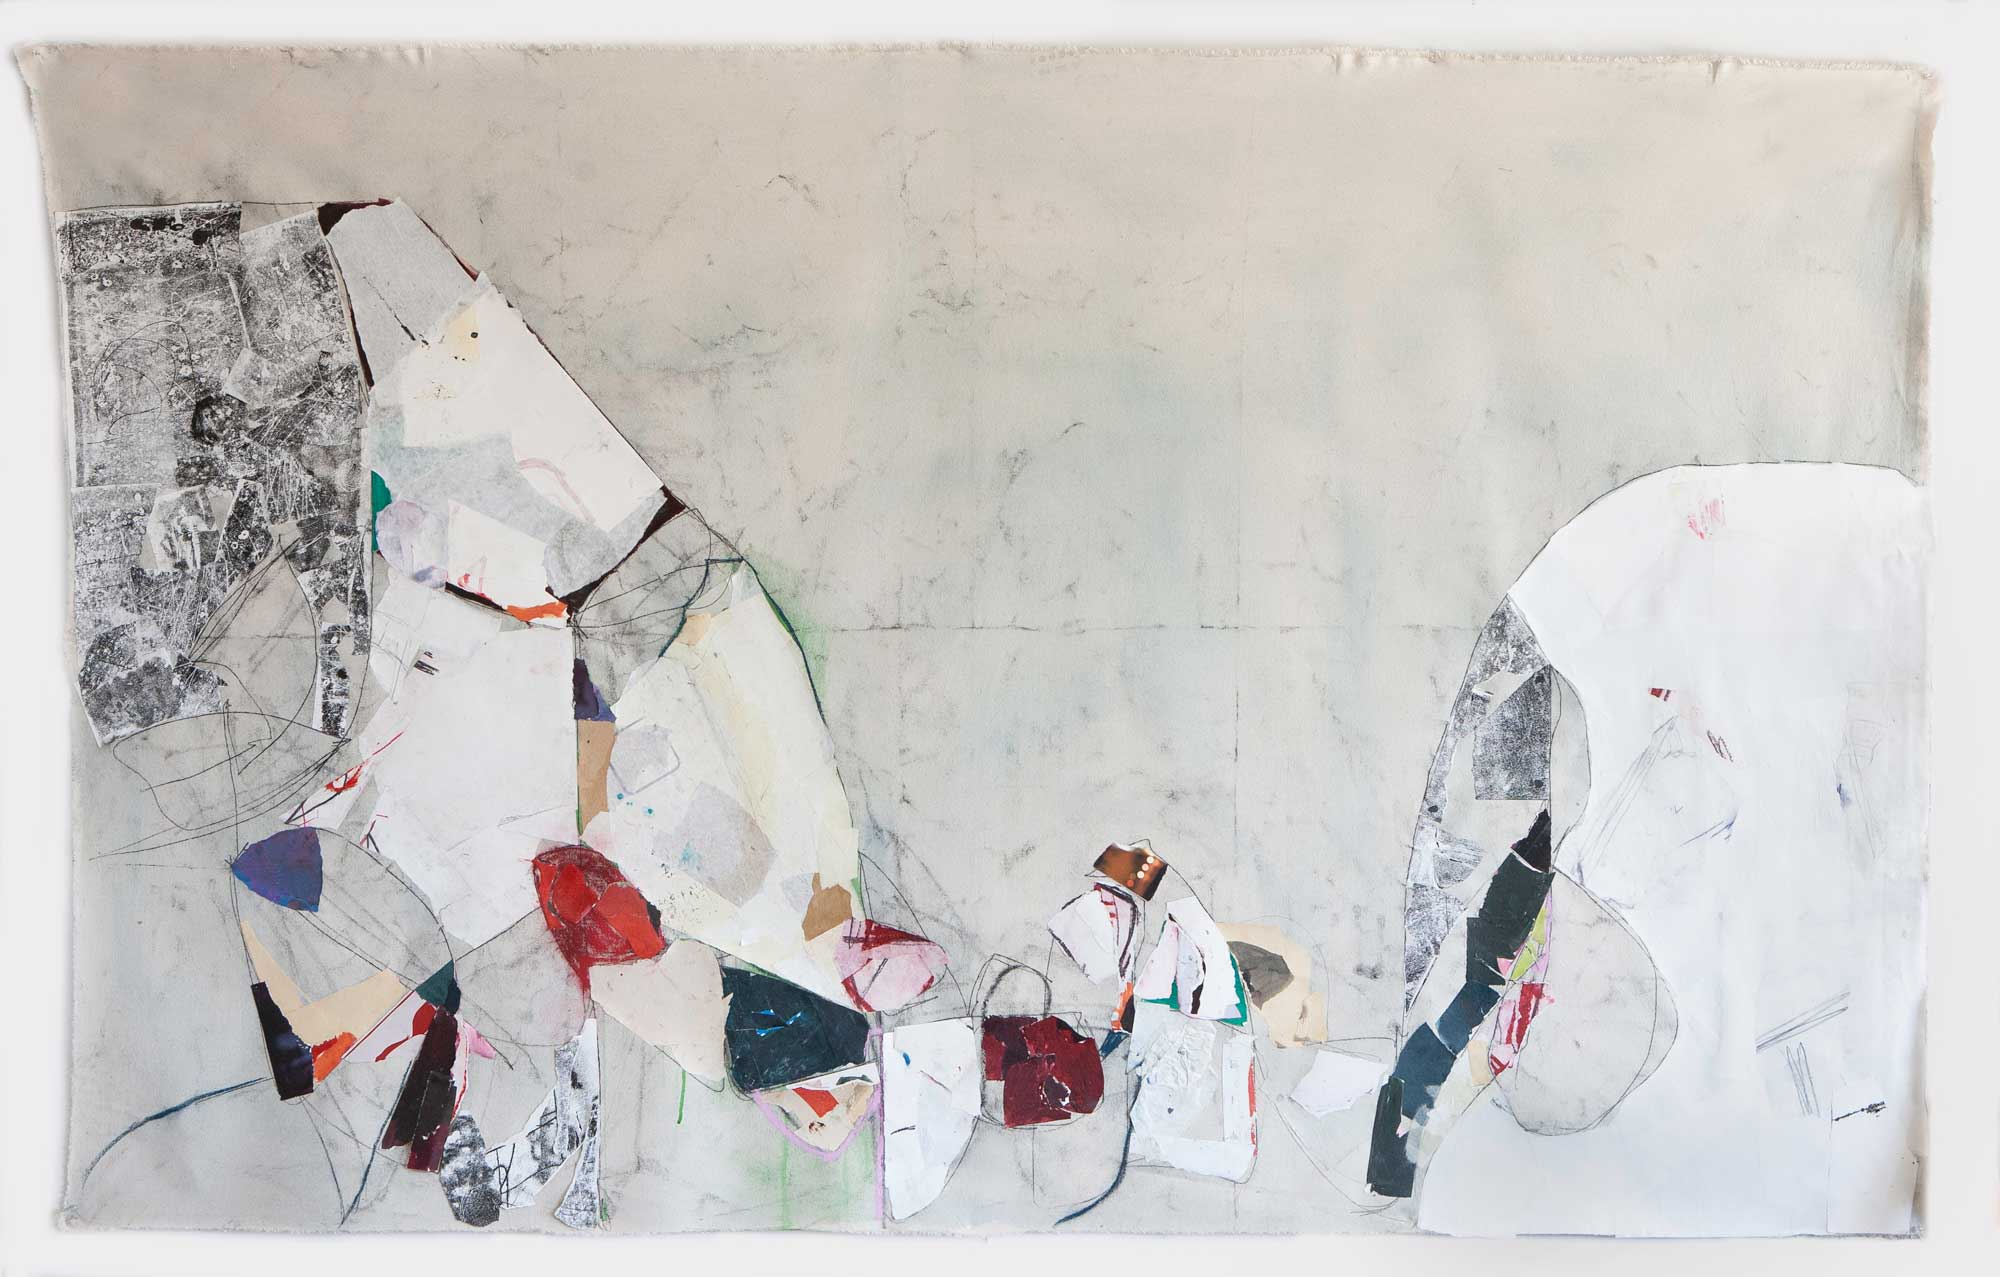 Granary Arts Jackie Leishman Heaving Into Mountains